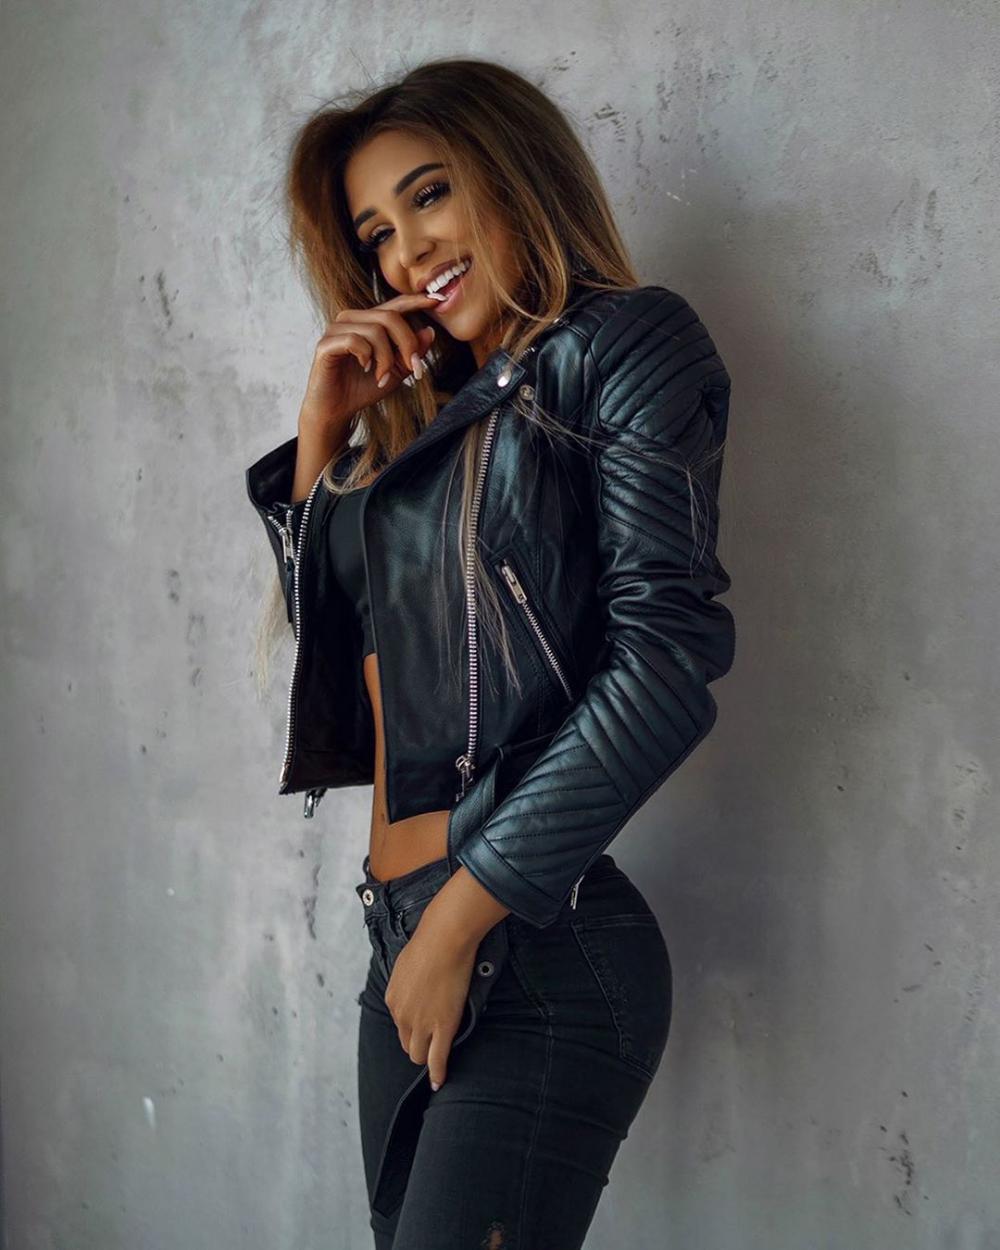 Ewa Staniszewska Bio Age Height Fitness Models Biography Fashion Leather Jacket Biker Jacket Outfit